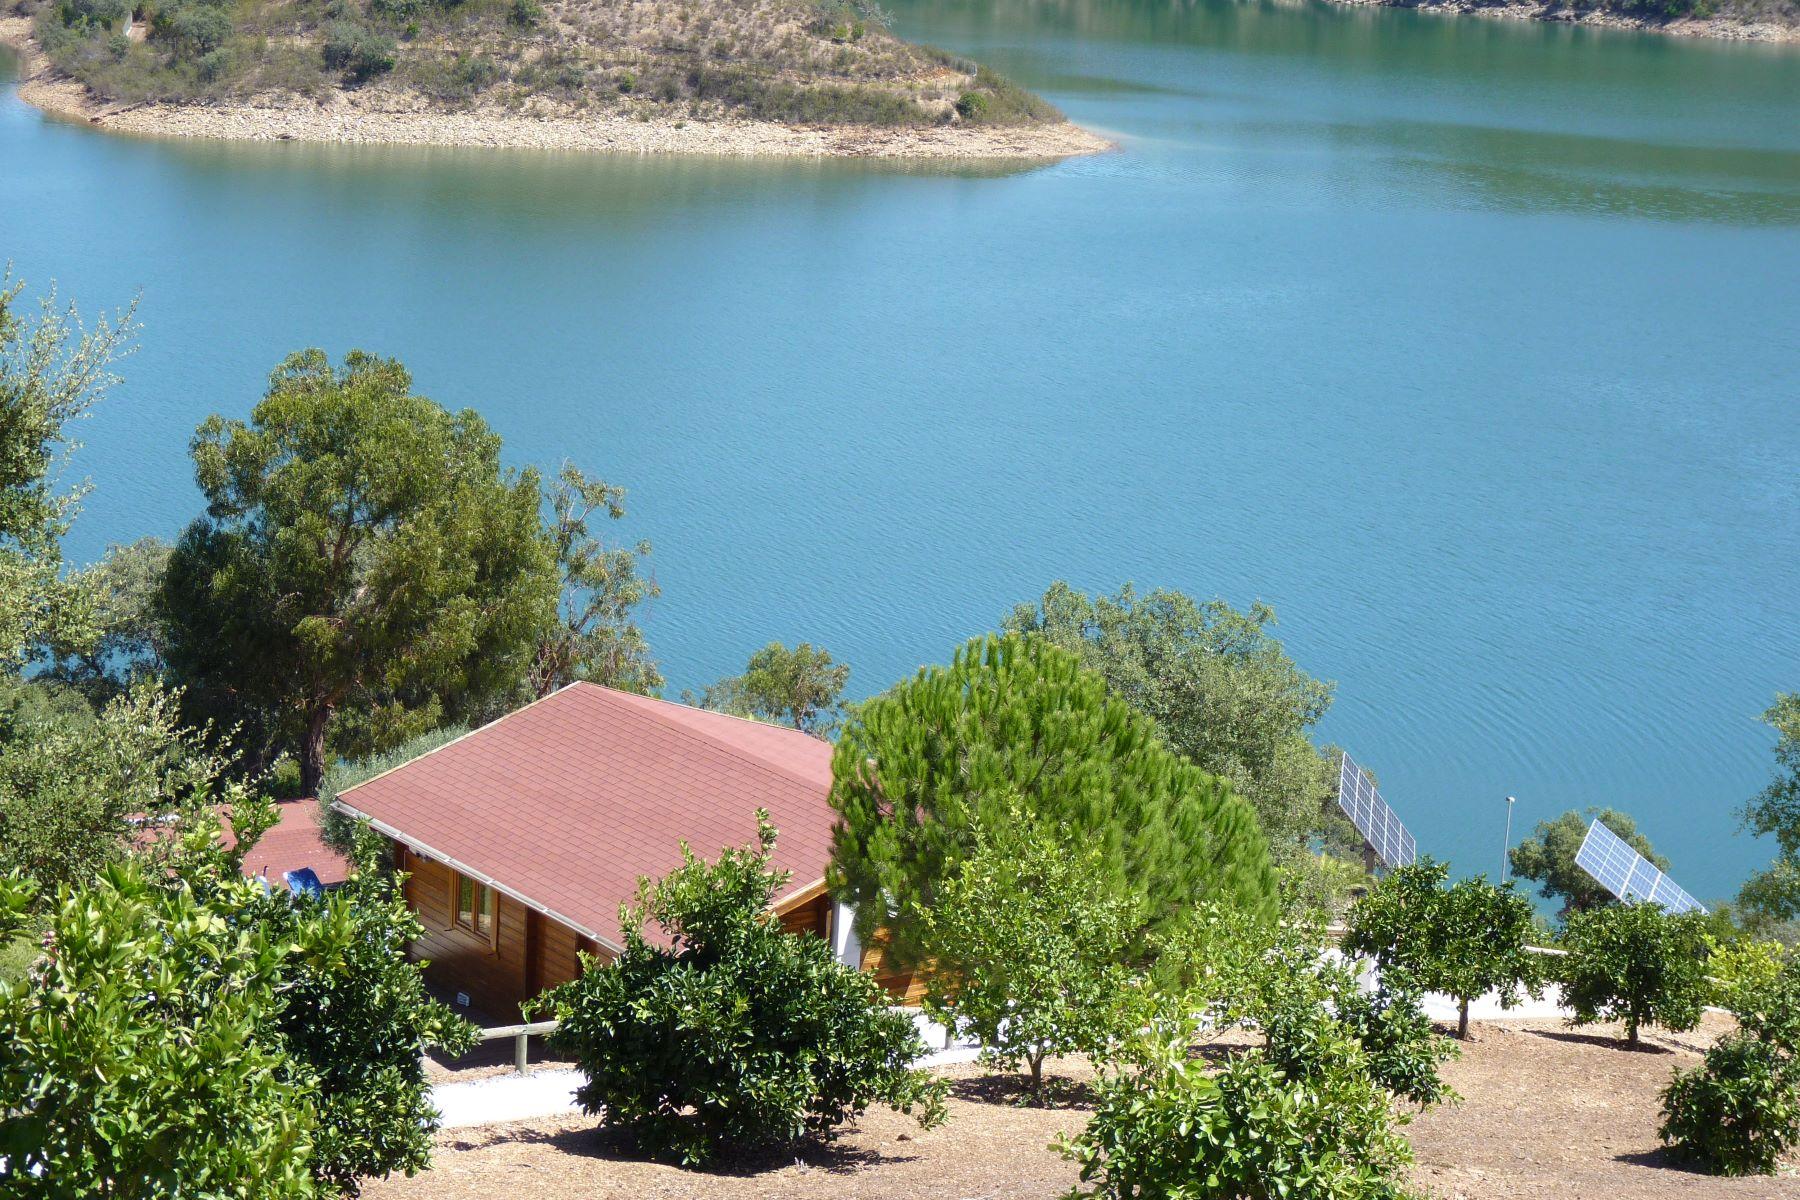 农场 / 牧场 / 种植园 为 销售 在 Country Estate, 5 bedrooms, for Sale 欧里克, 贝雅 葡萄牙